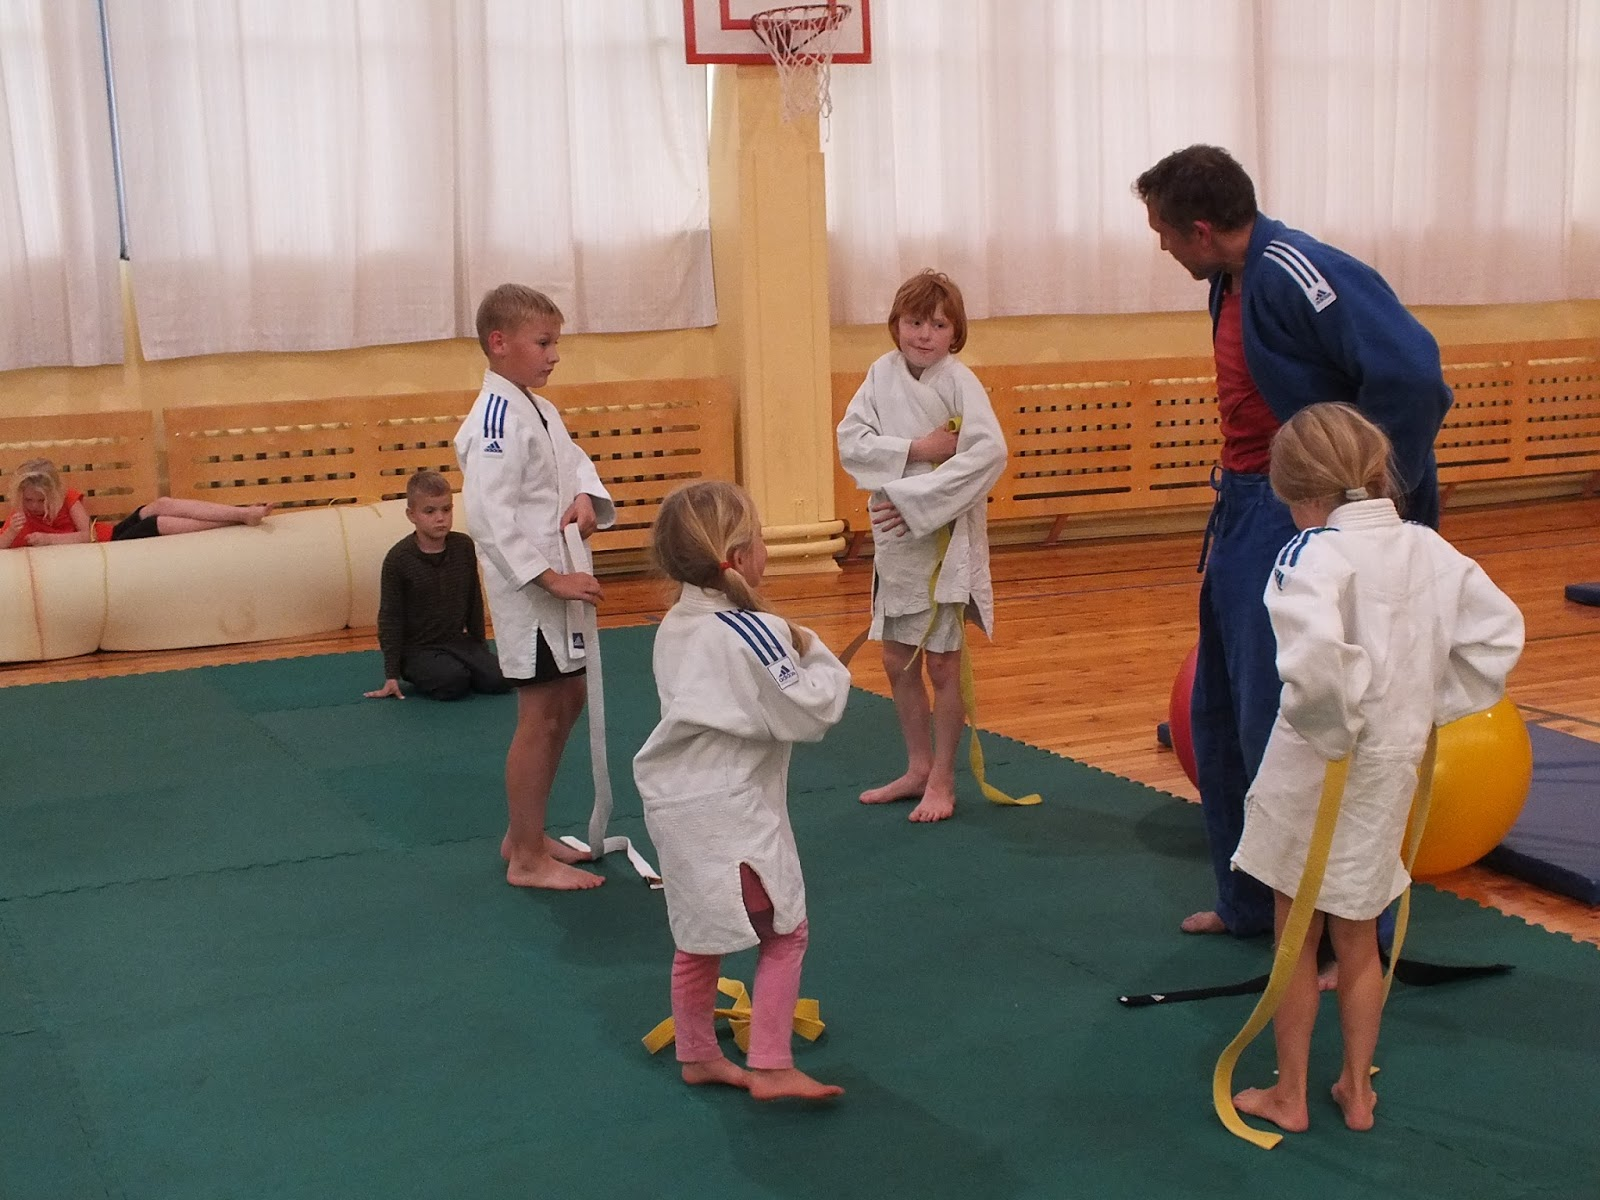 Tööd alustas judoring